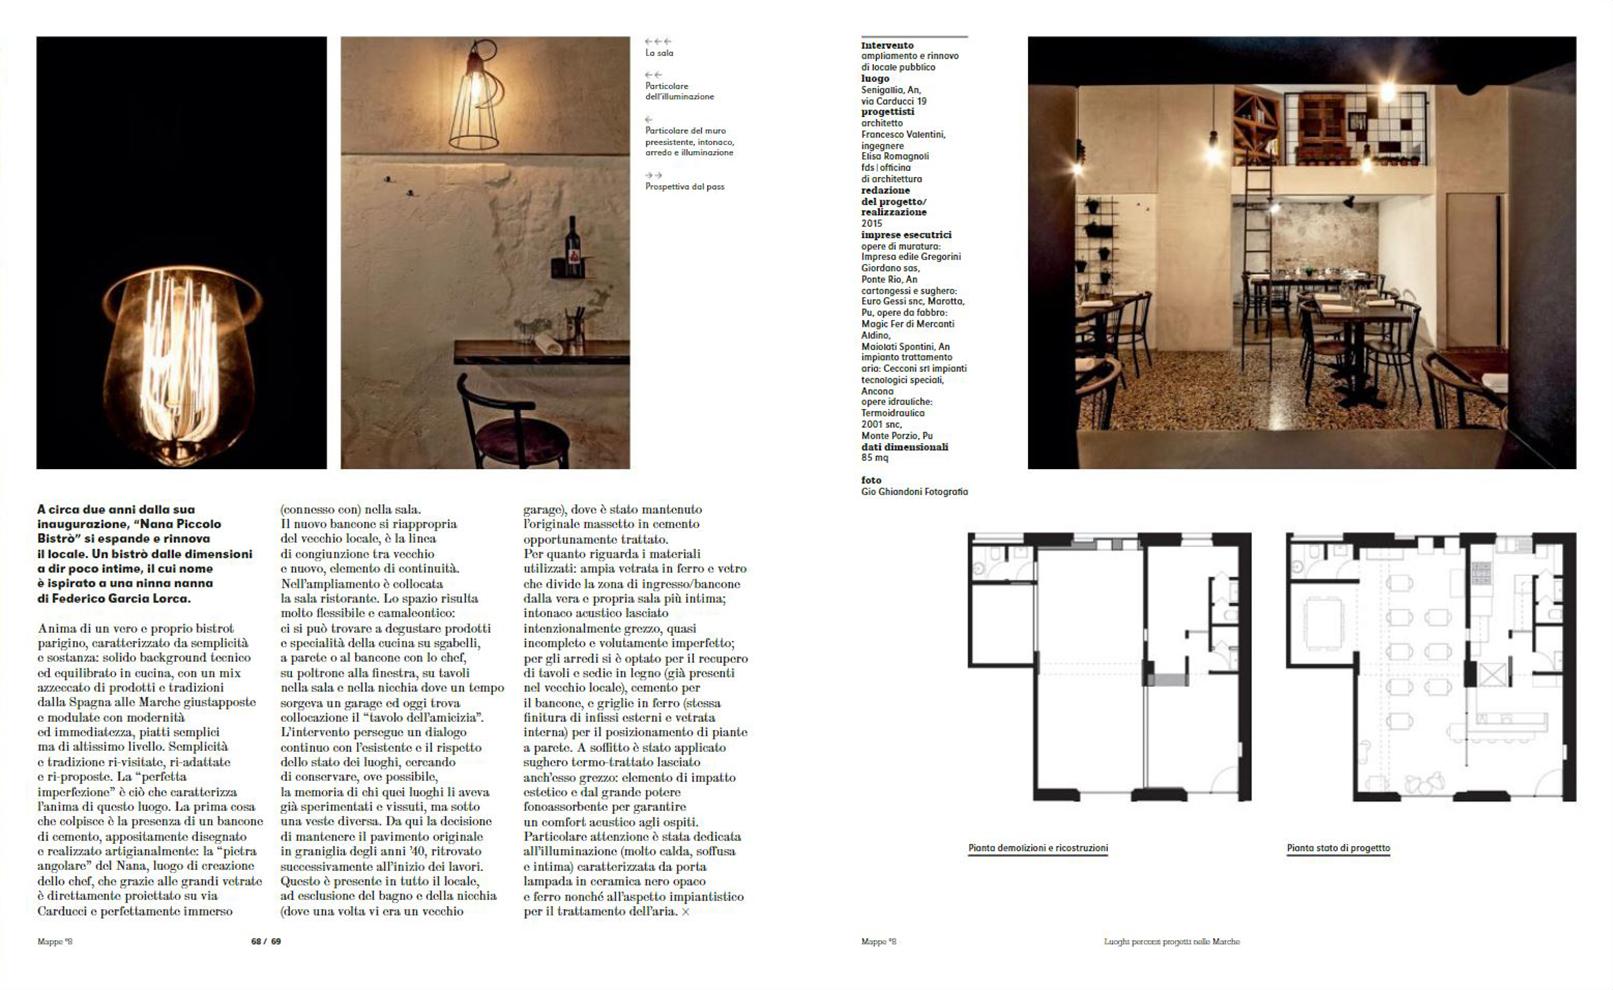 press - mappe 8